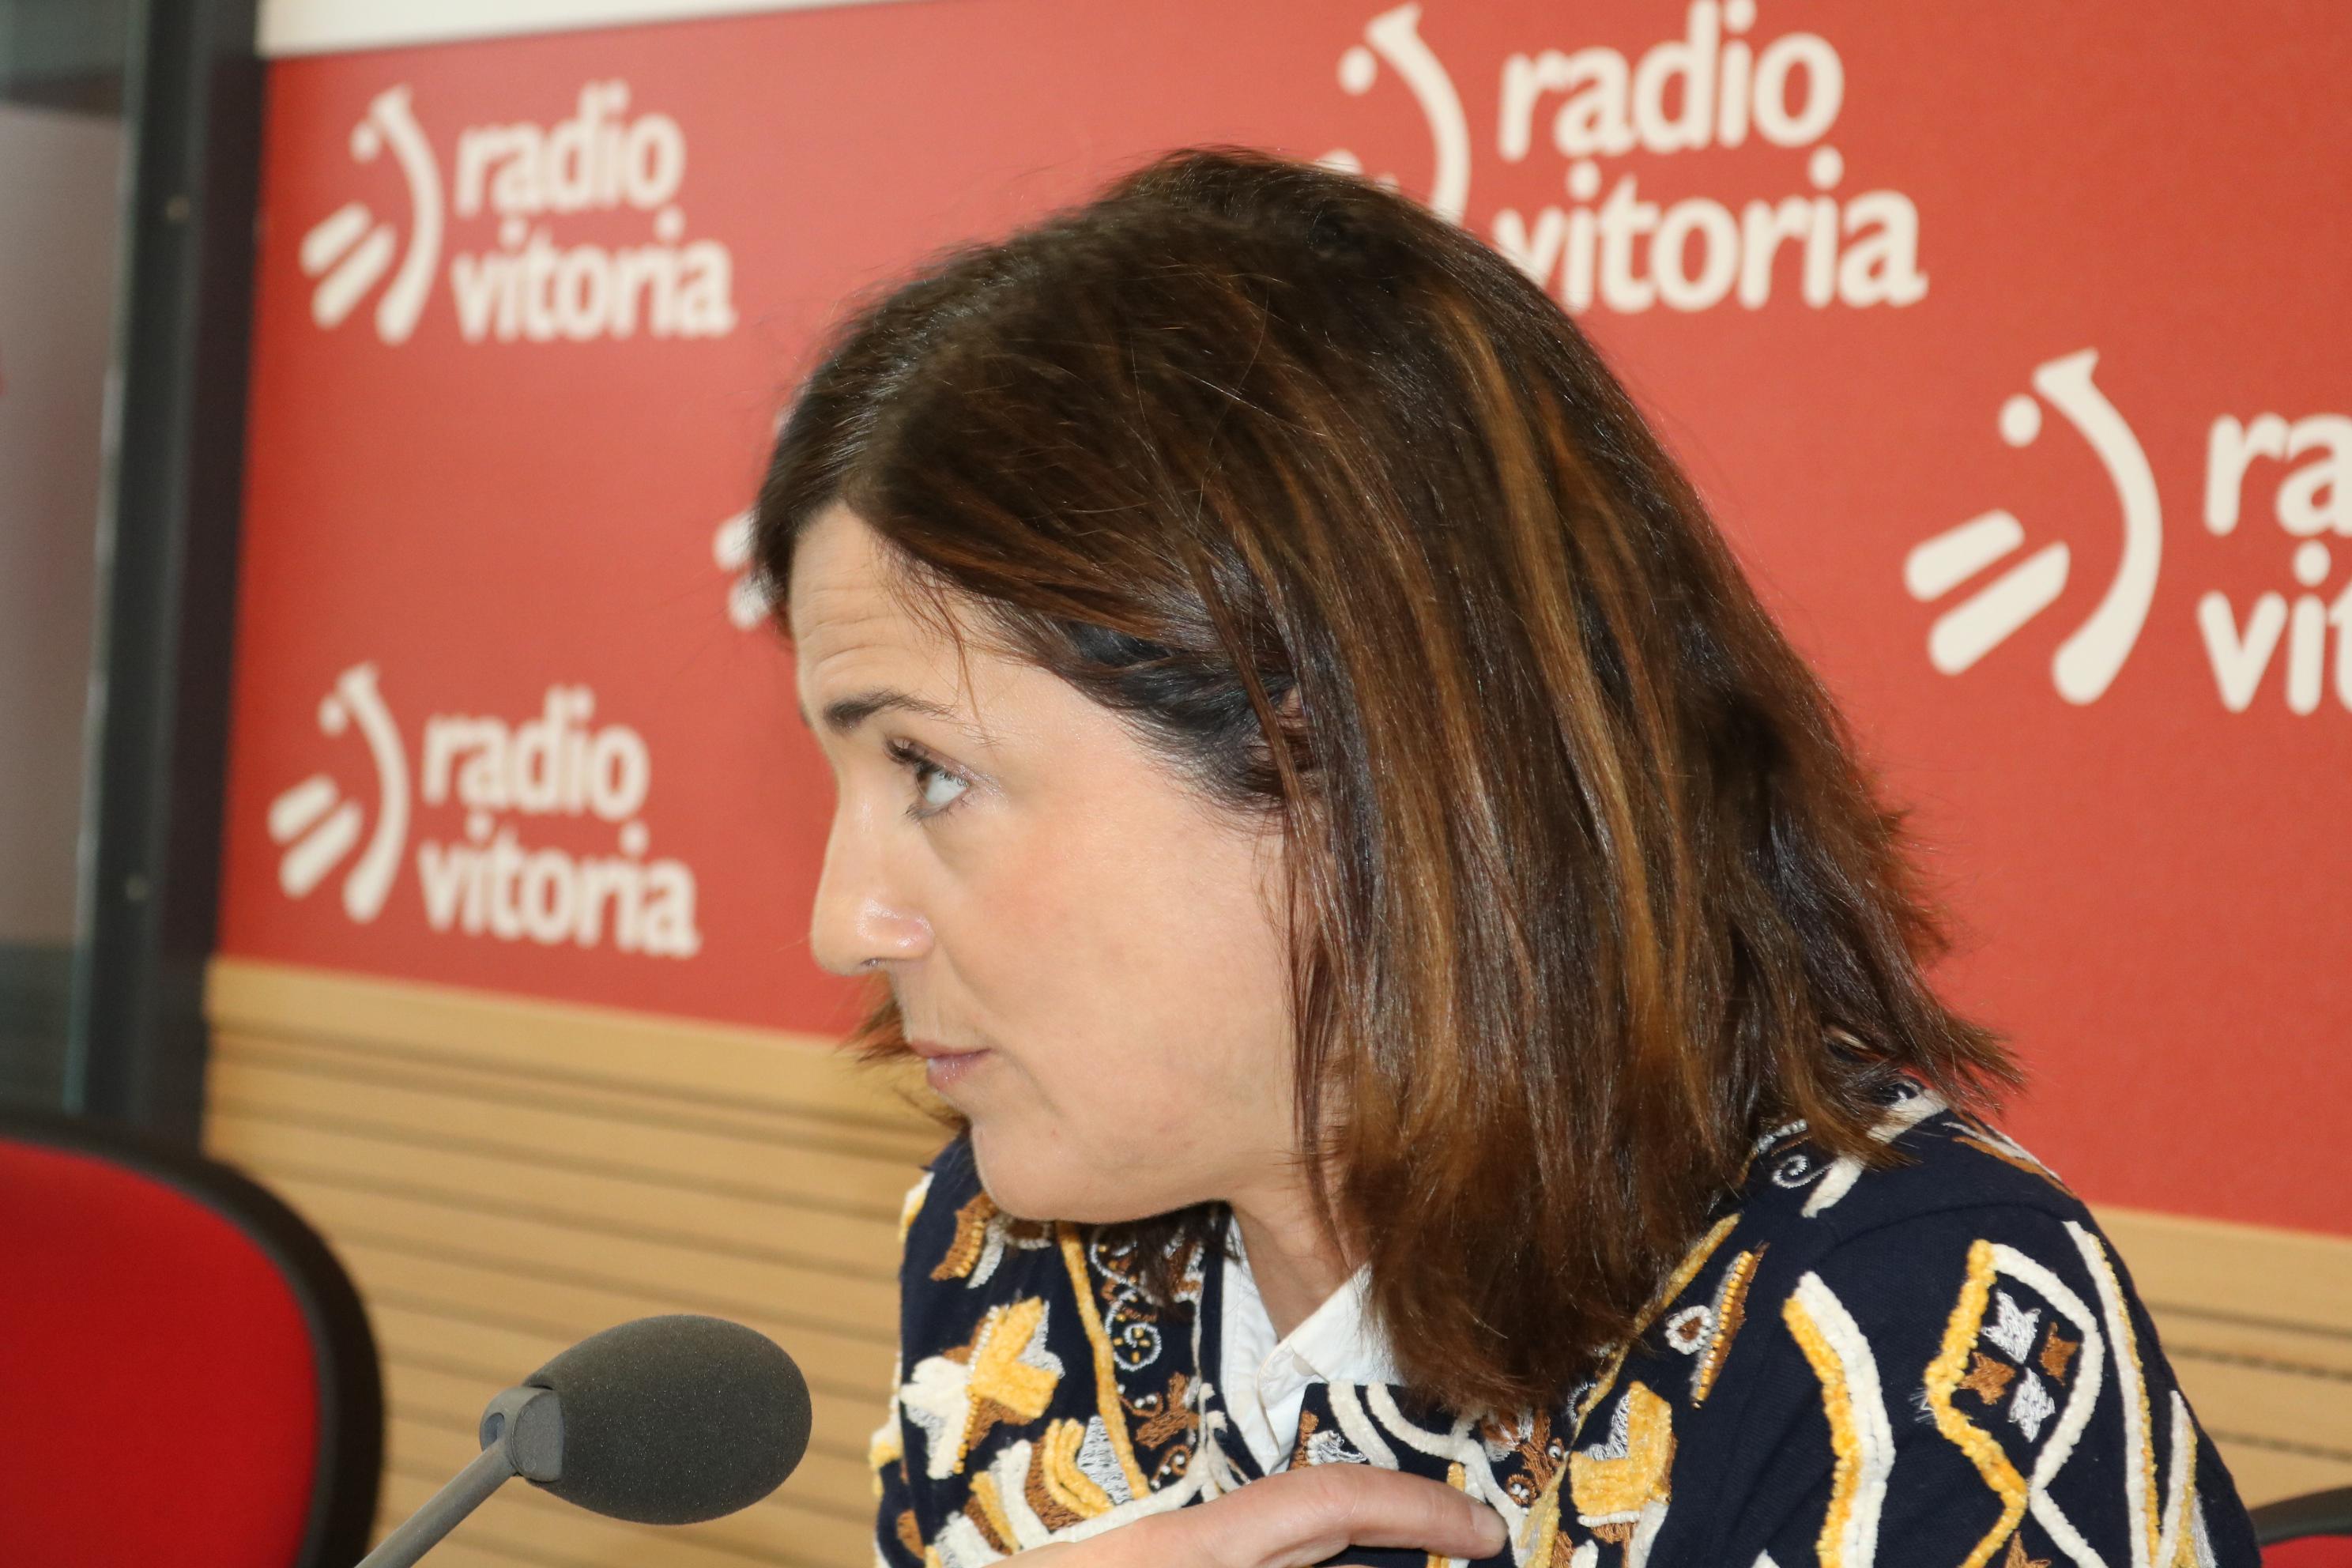 radio_vitoria_01.jpg